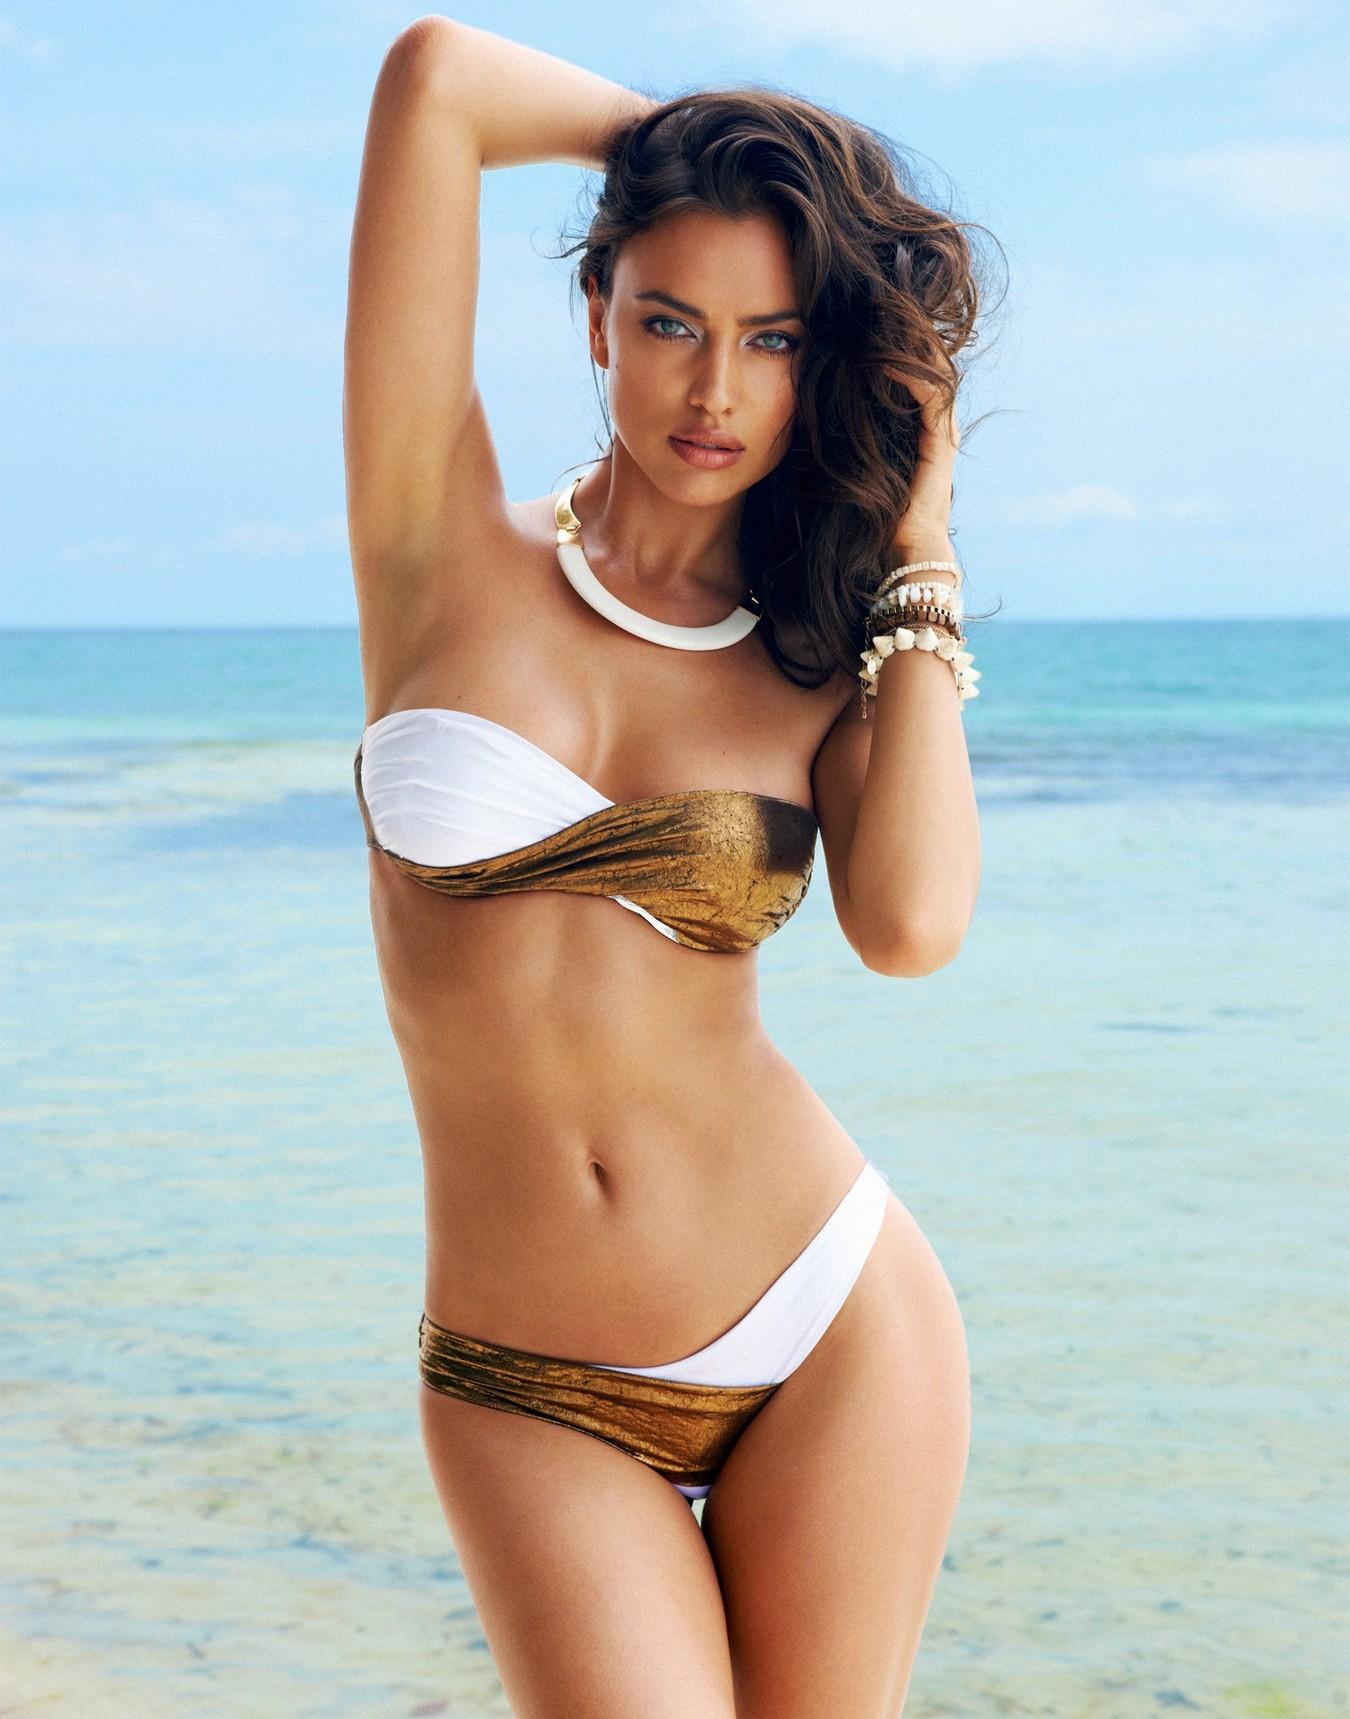 Fondos de pantalla mujer modelo pelo largo fotograf a bikini